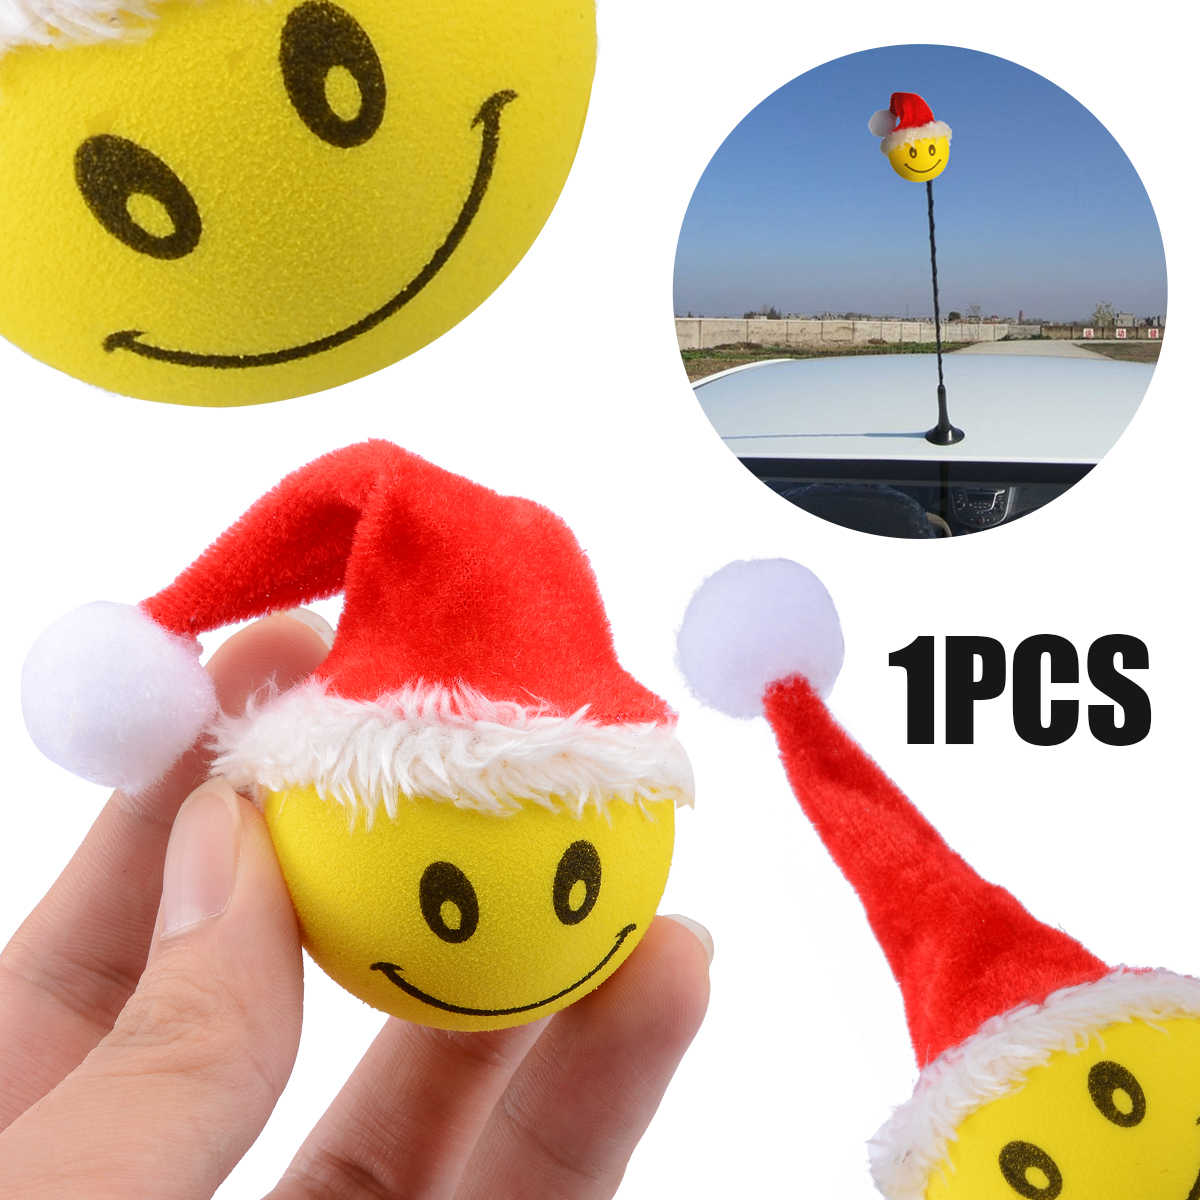 MAYITR Christmas Smiley Happy Face Santa Claus Car Antenna Topper Cartoon  Ball Aerial Pen Topper Car Roof Accessories